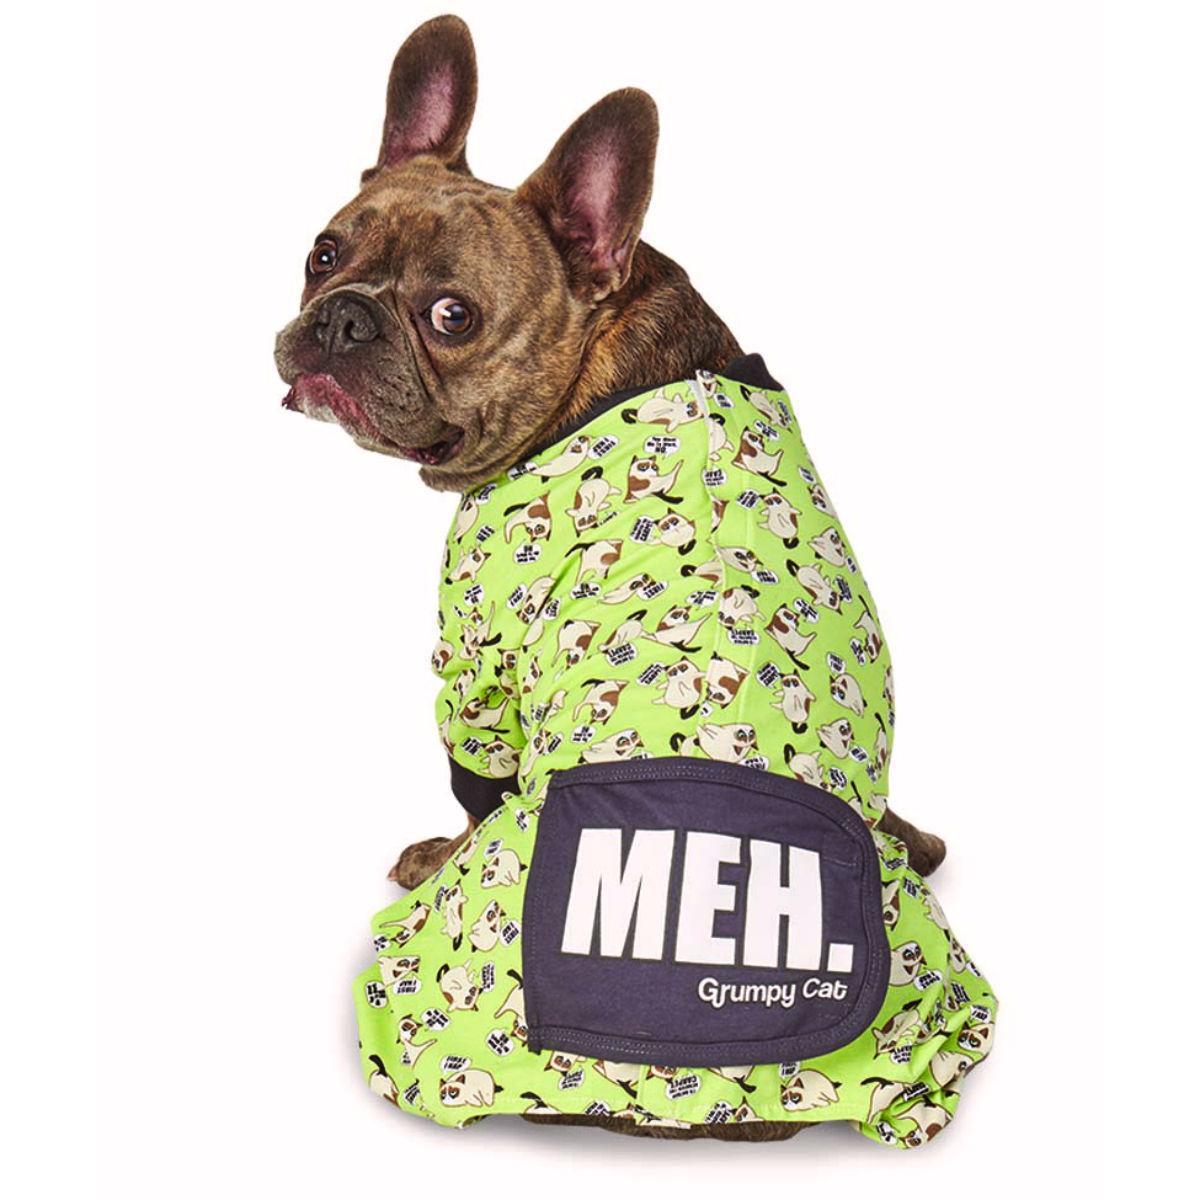 Grumpy Cat Meh Dog Pajamas - Green